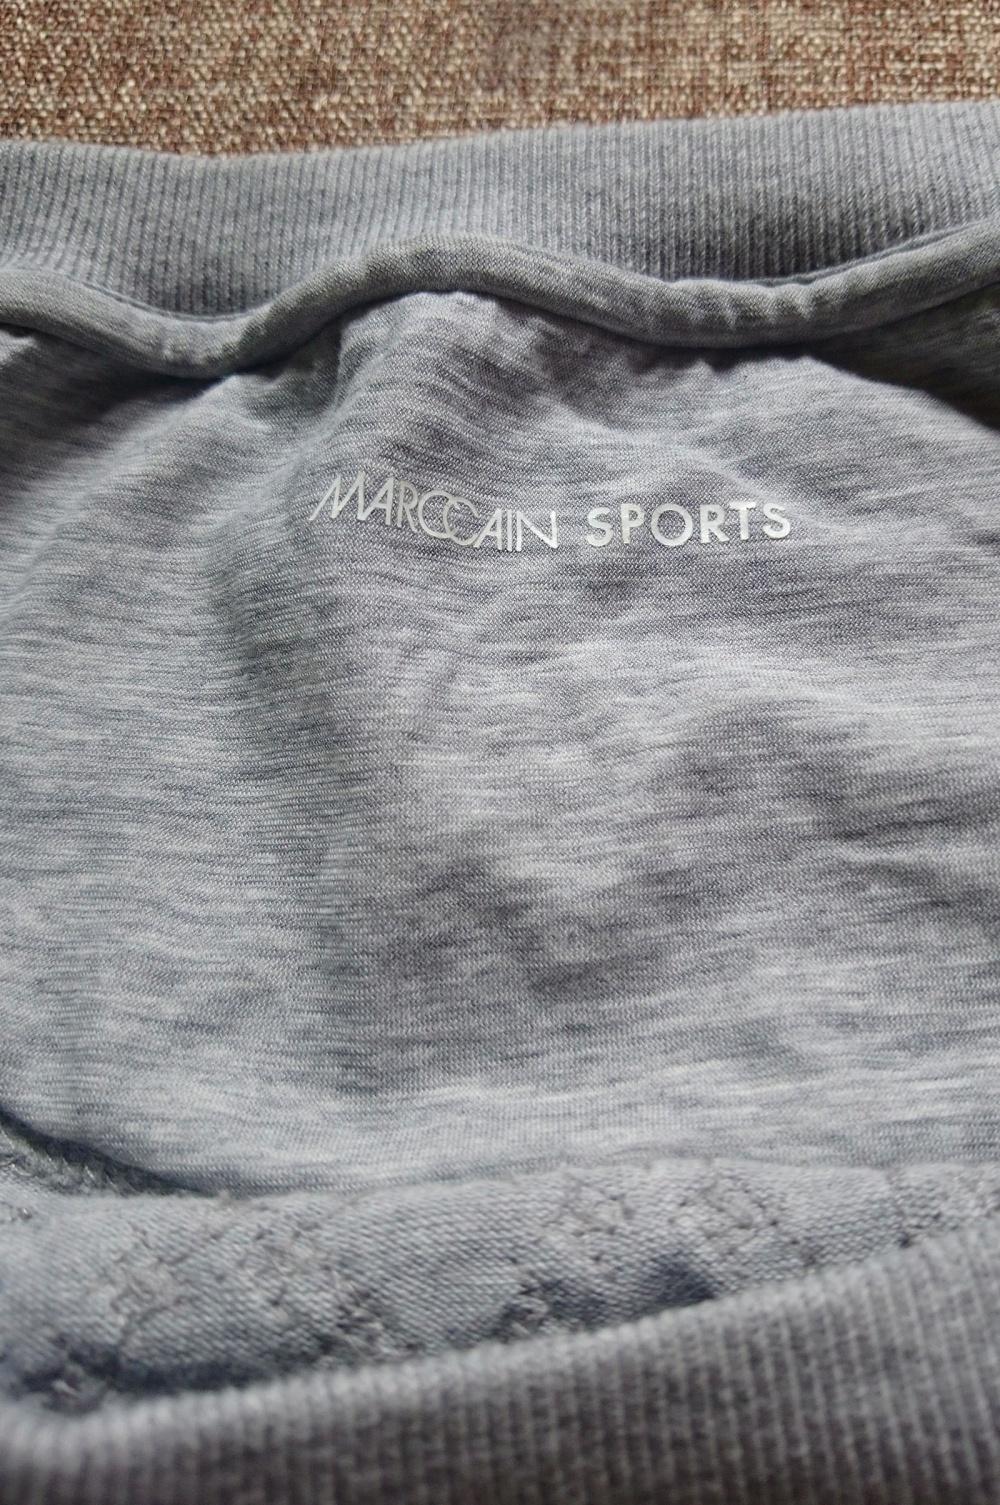 Толстовка MarcCain, 44-46 размеры